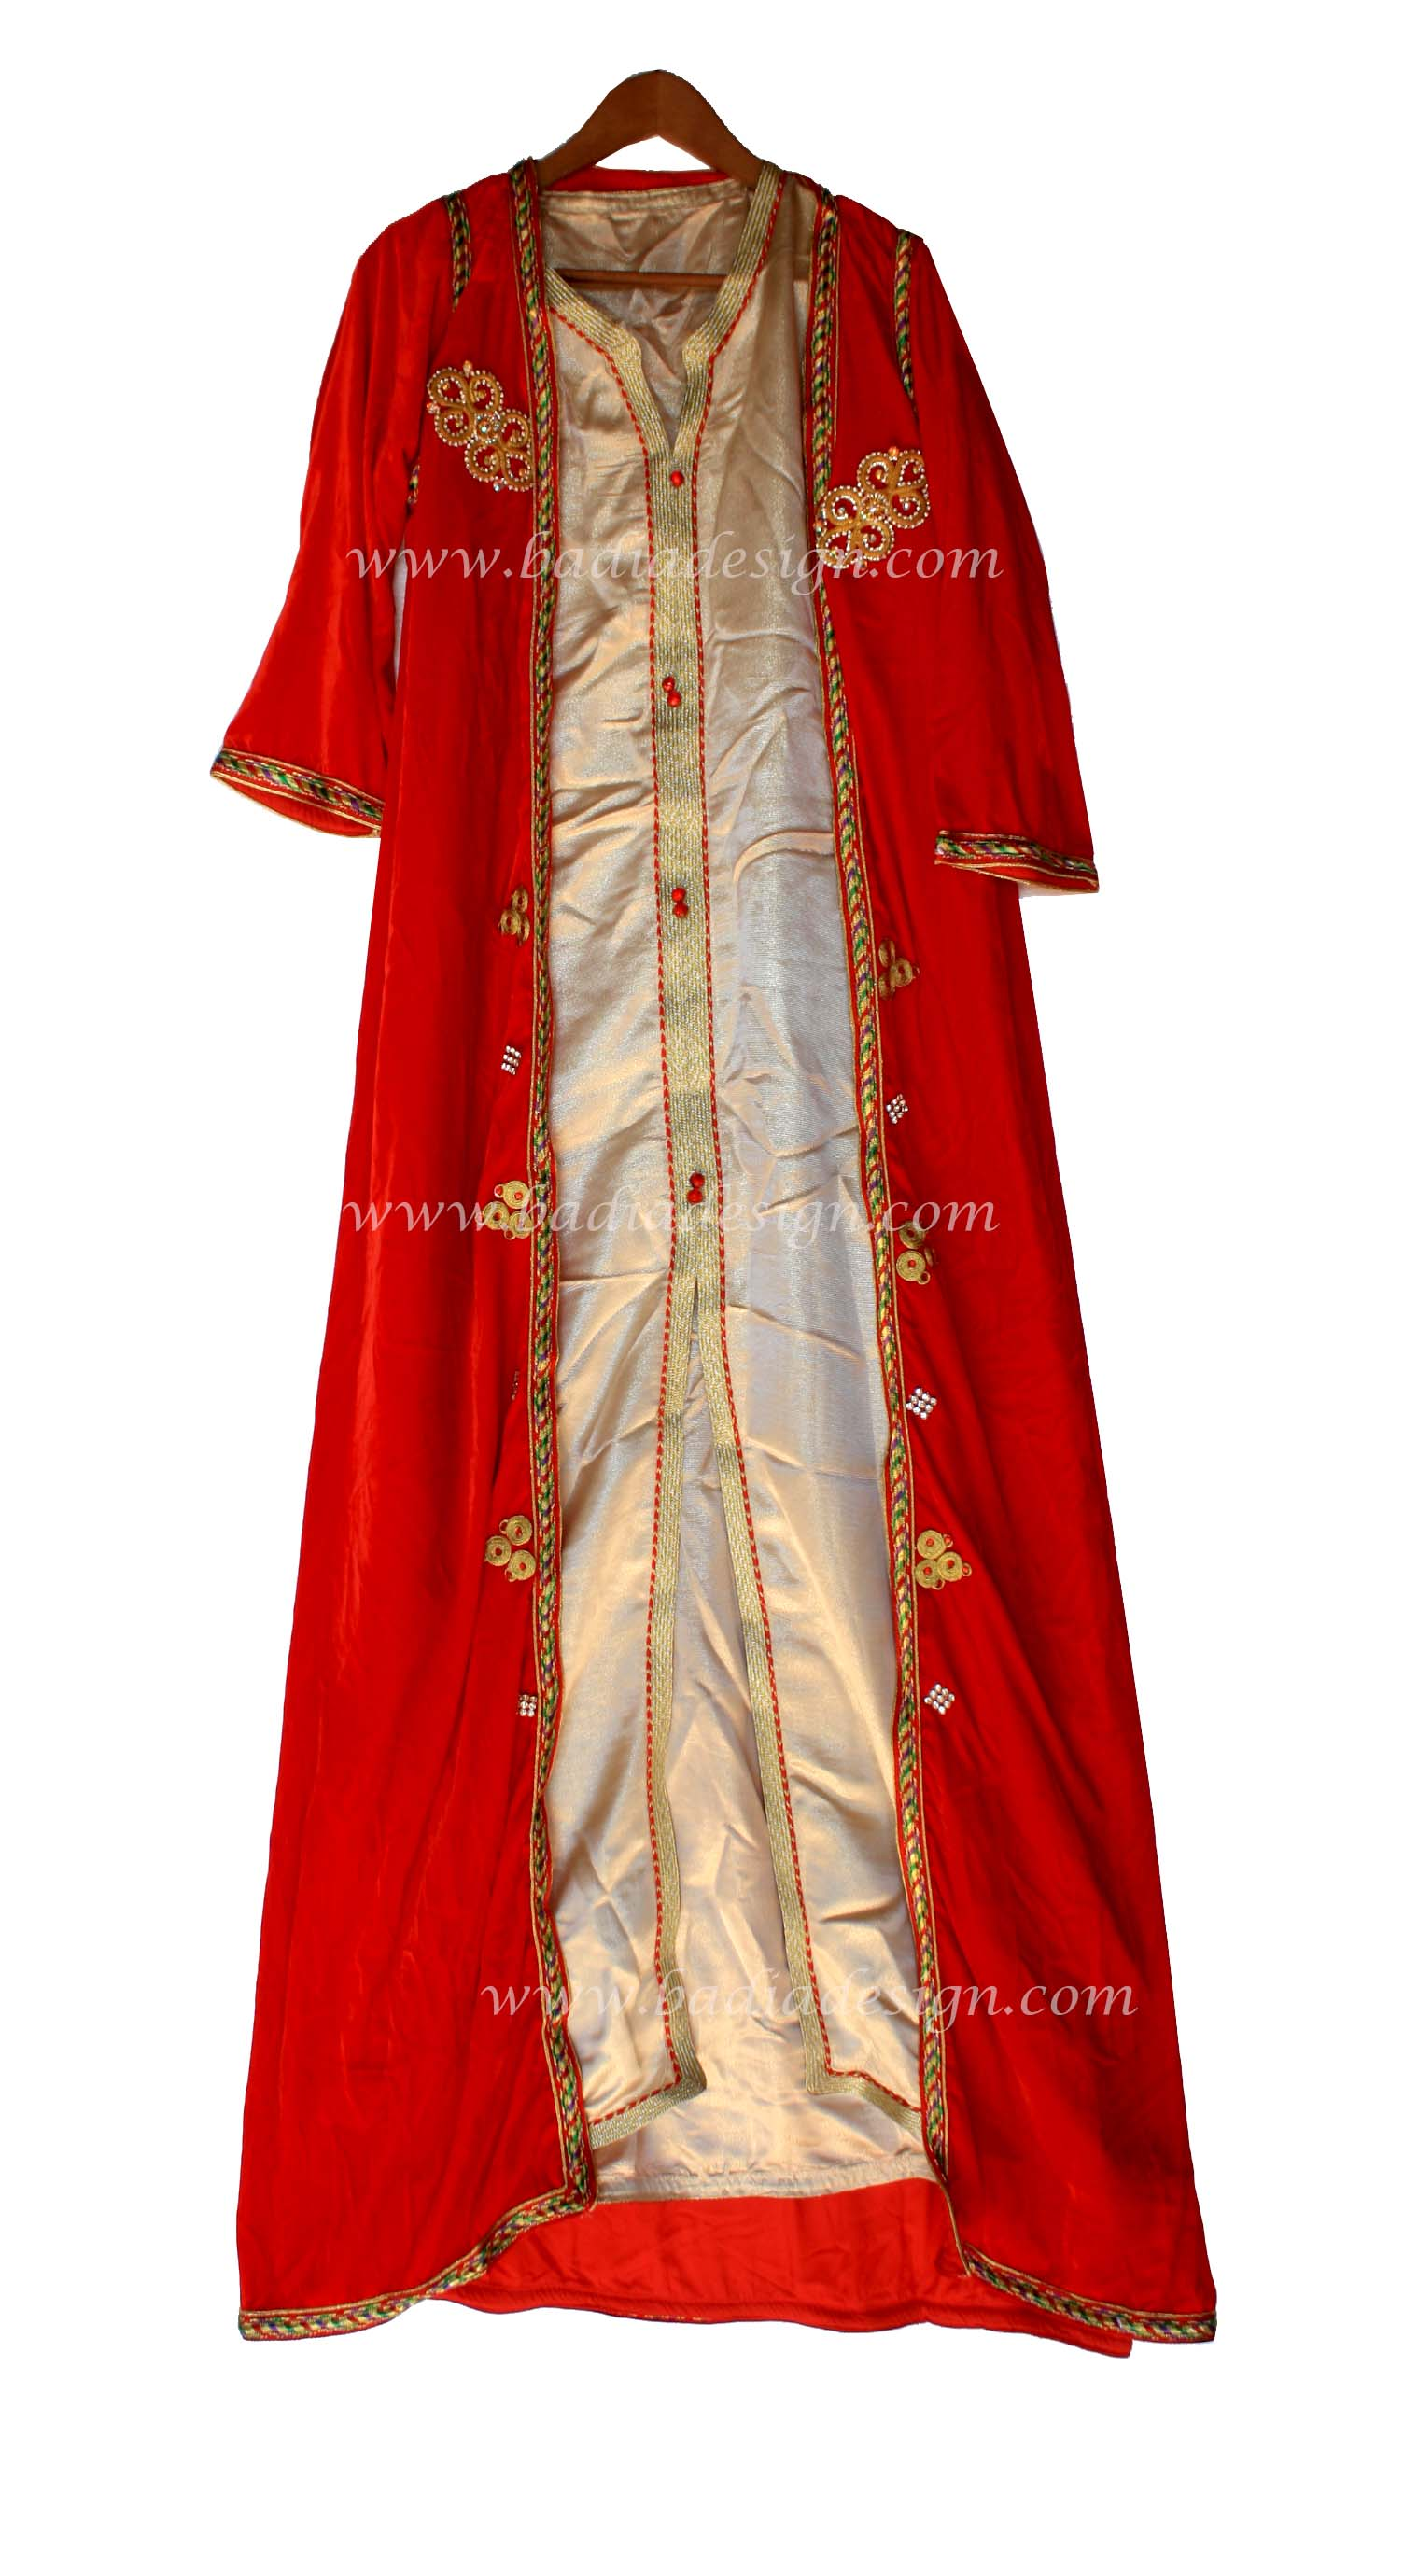 Moroccan kaftan, Moroccan kaftan dress, Moroccan wedding kaftan, handmade Moroccan kaftan, what is a kaftan, Moroccan kaftan for women, Moroccan kaftan for men, Moroccan clothing, Moroccan kaftan from Badia Design, Moroccan wedding kaftan dresses, Senegalese kaftan, Moroccan kaftans online, Moroccan kaftan dresses for sale, Moroccan caftan, Moroccan wedding caftan